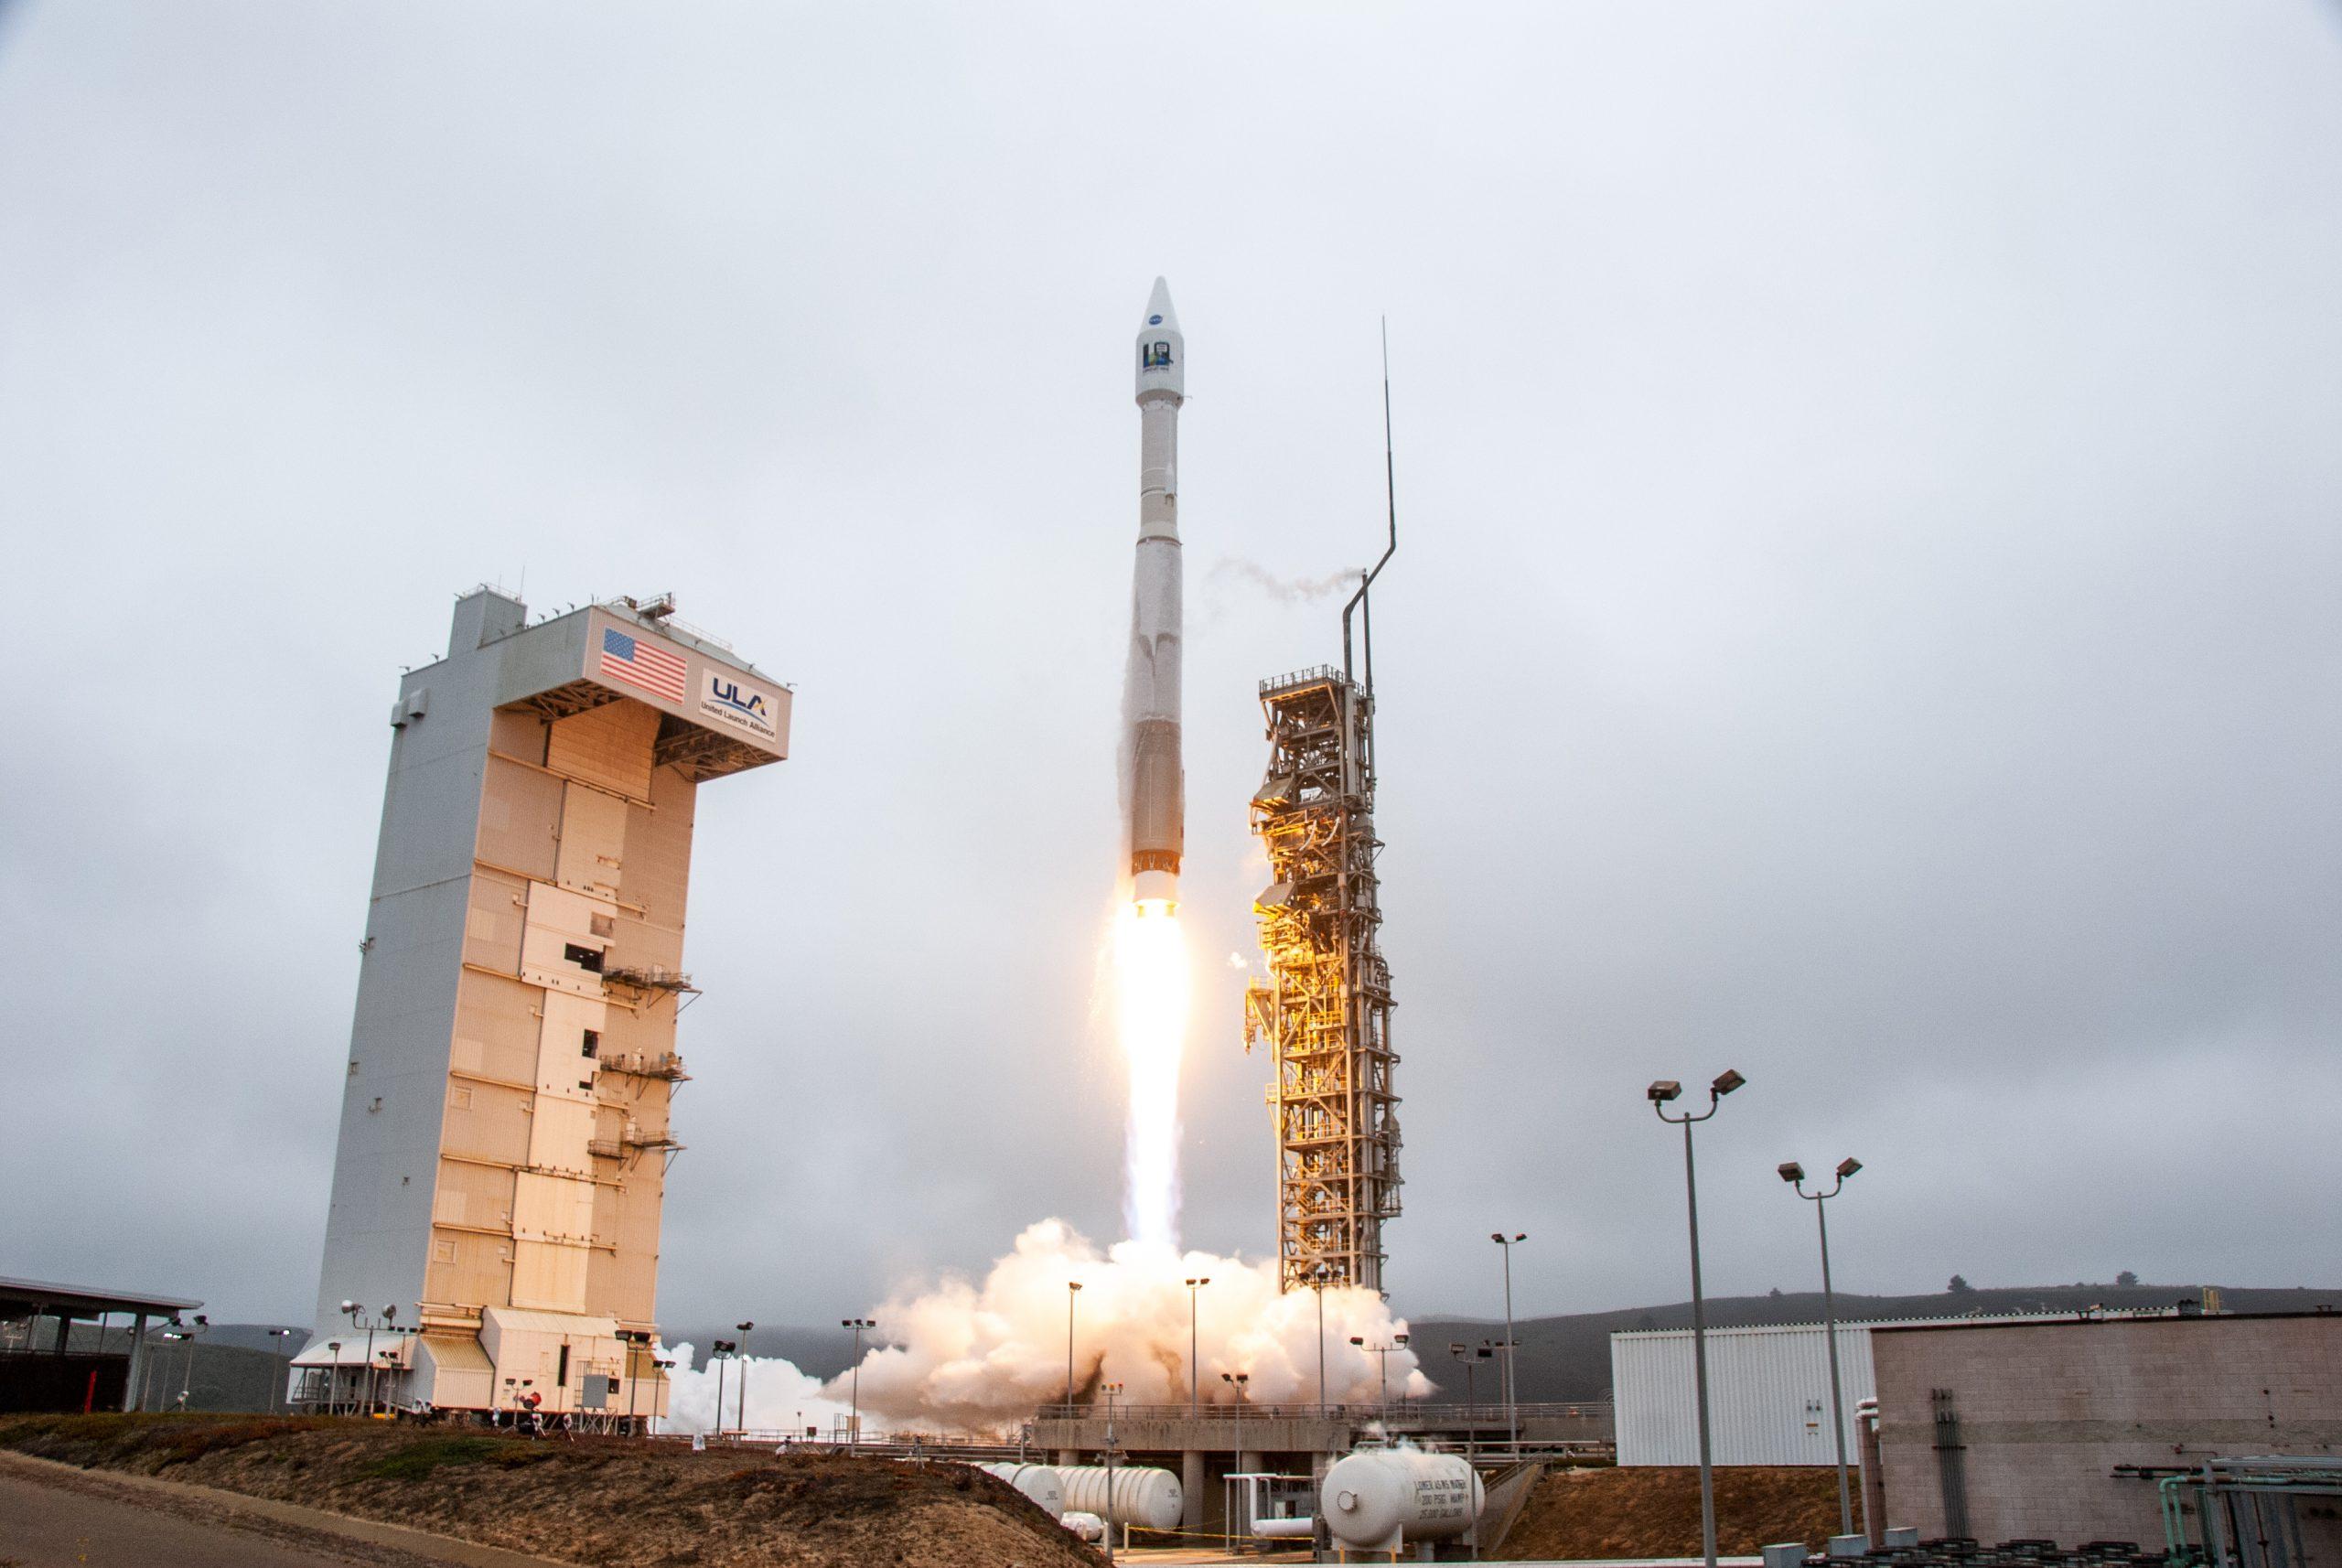 The United Launch Alliance Atlas V rocket launches the Landsat 9 satellite into near-polar, sun-synchronous orbit from Vandenberg Space Force Base on Sept. 27, 2021.